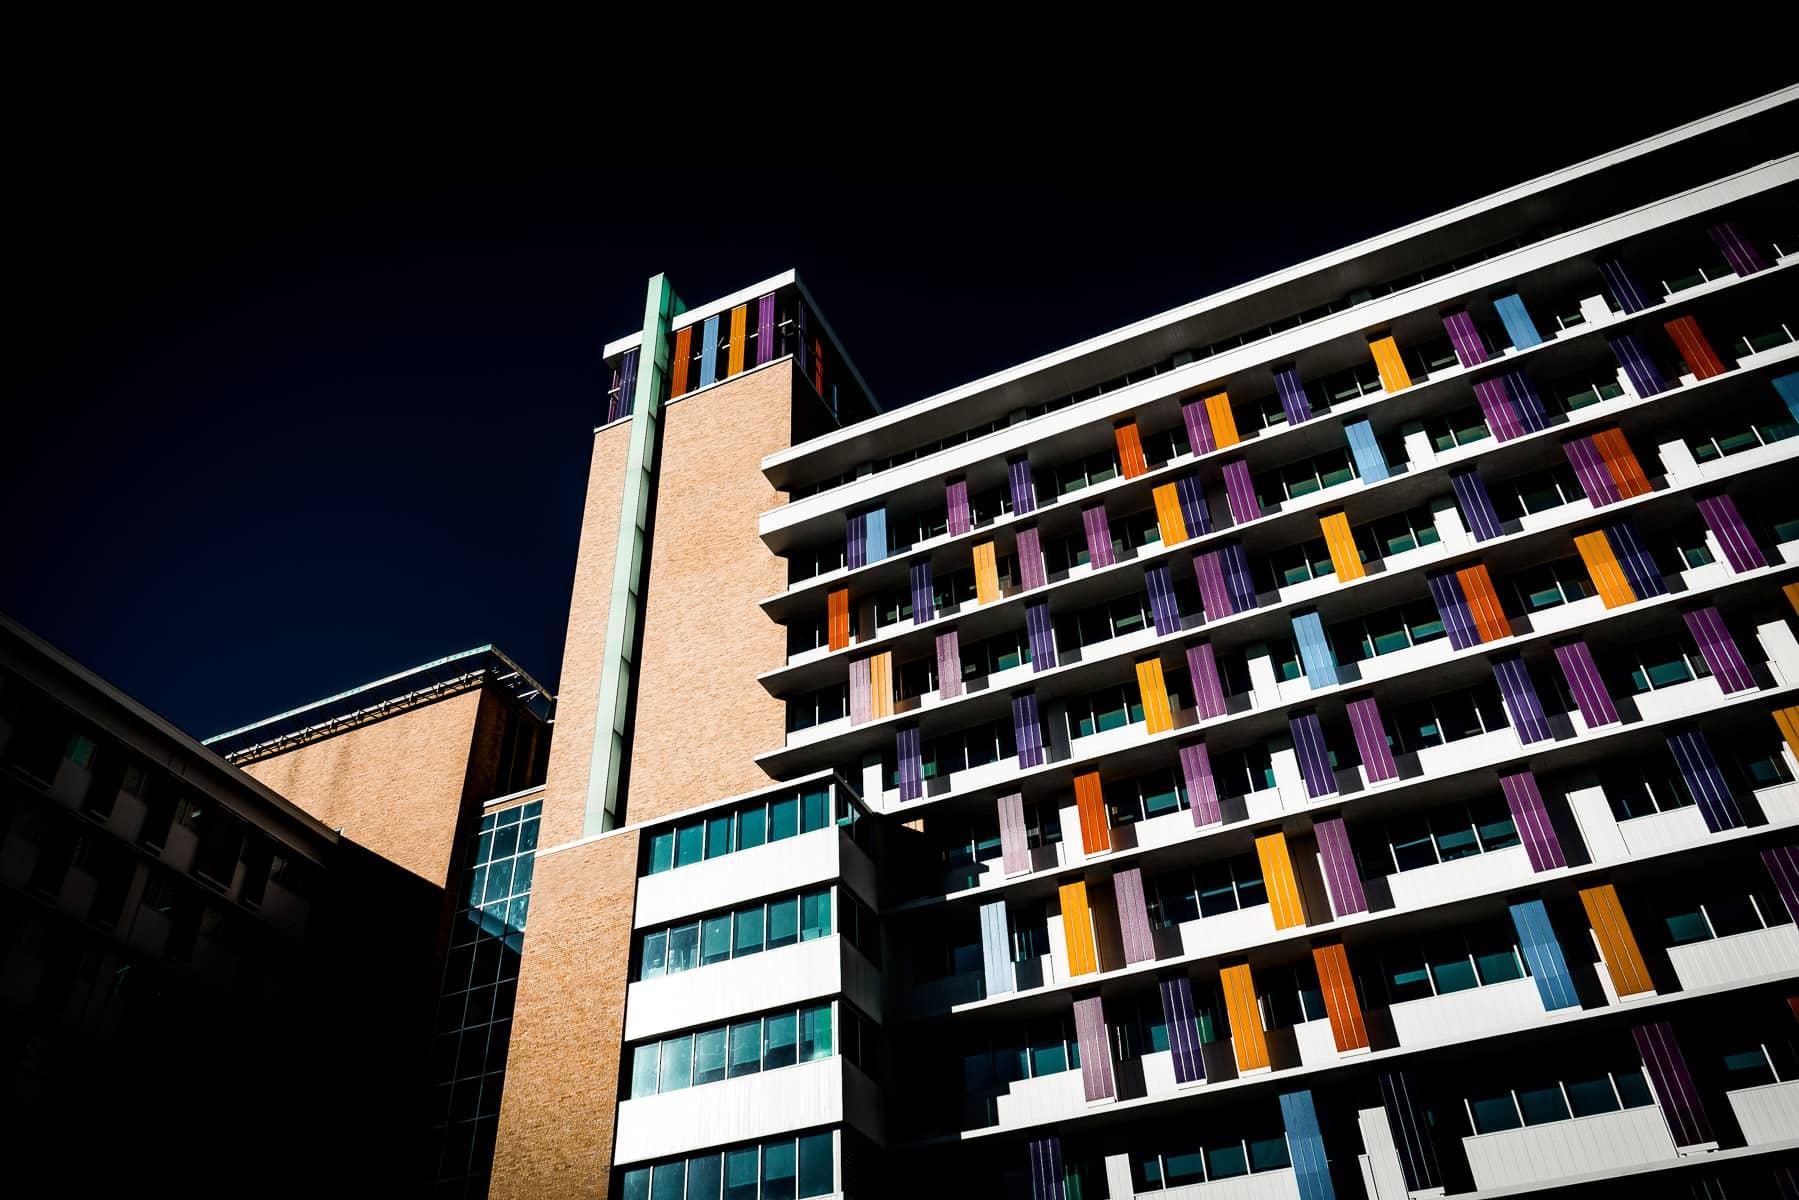 The multi-colored facade of theChildren's Hospital of San Antonio, Texas.